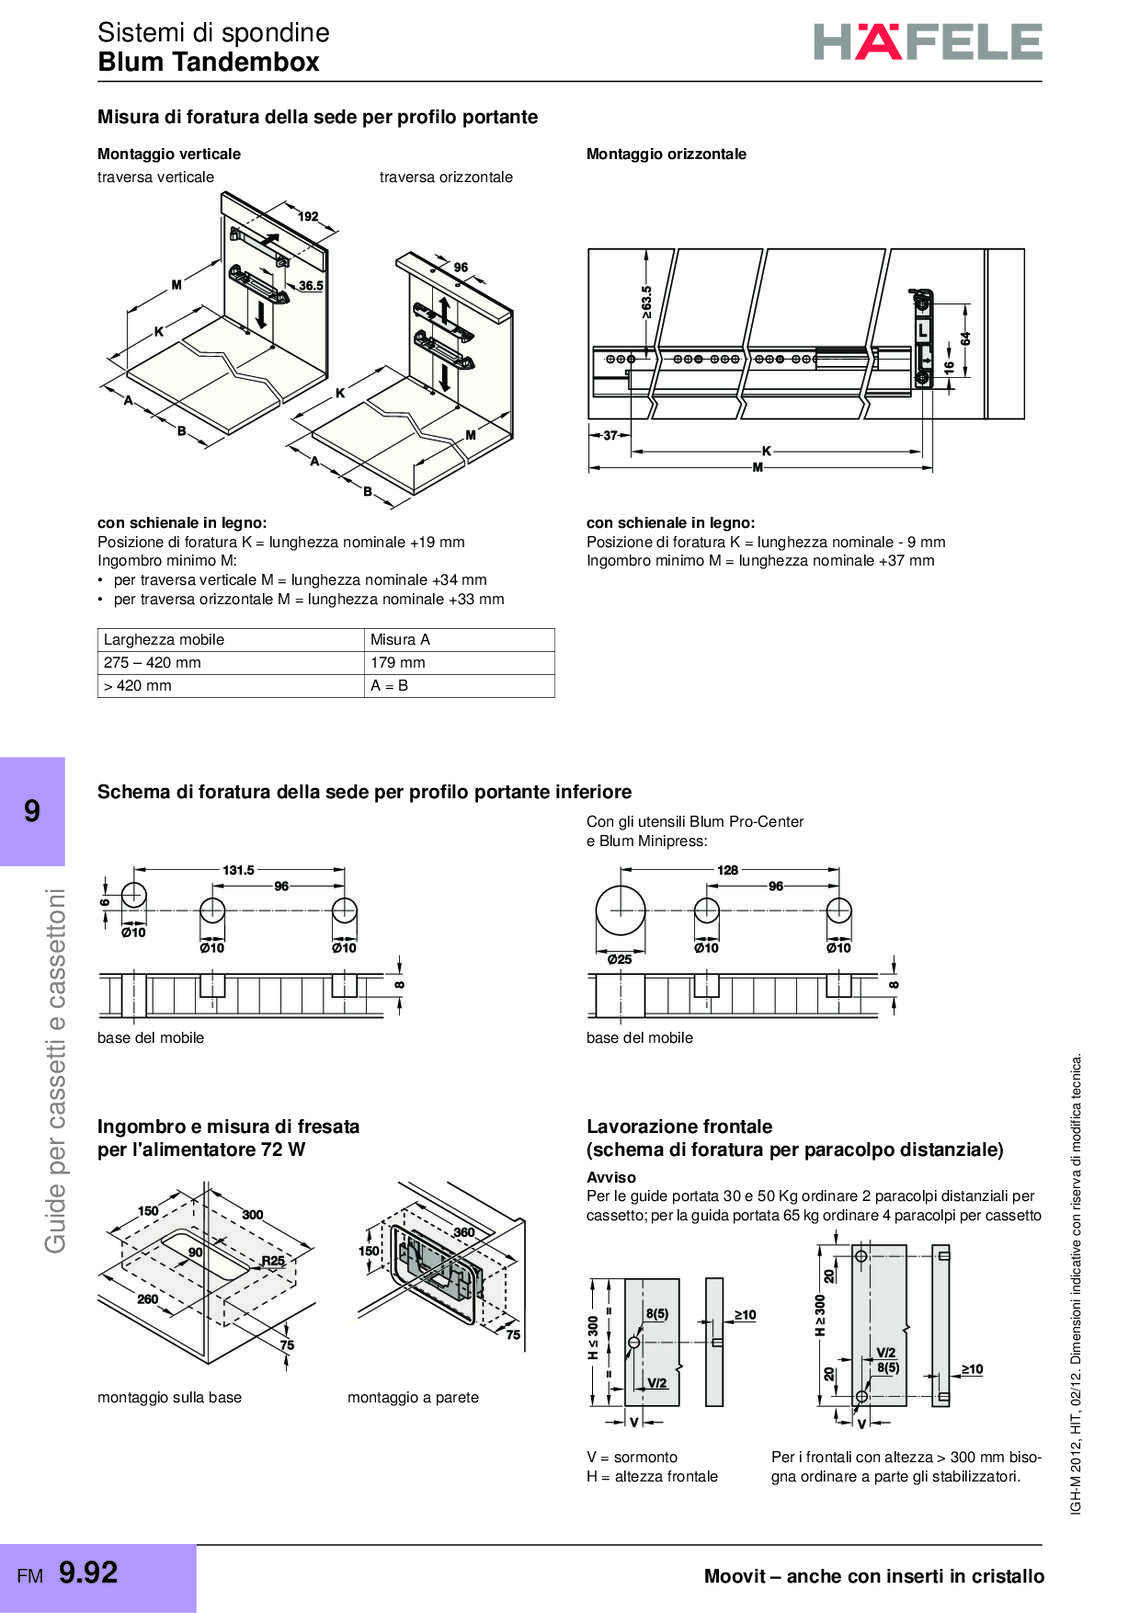 hafele-spondine-e-guide-per-mobili_40_115.jpg